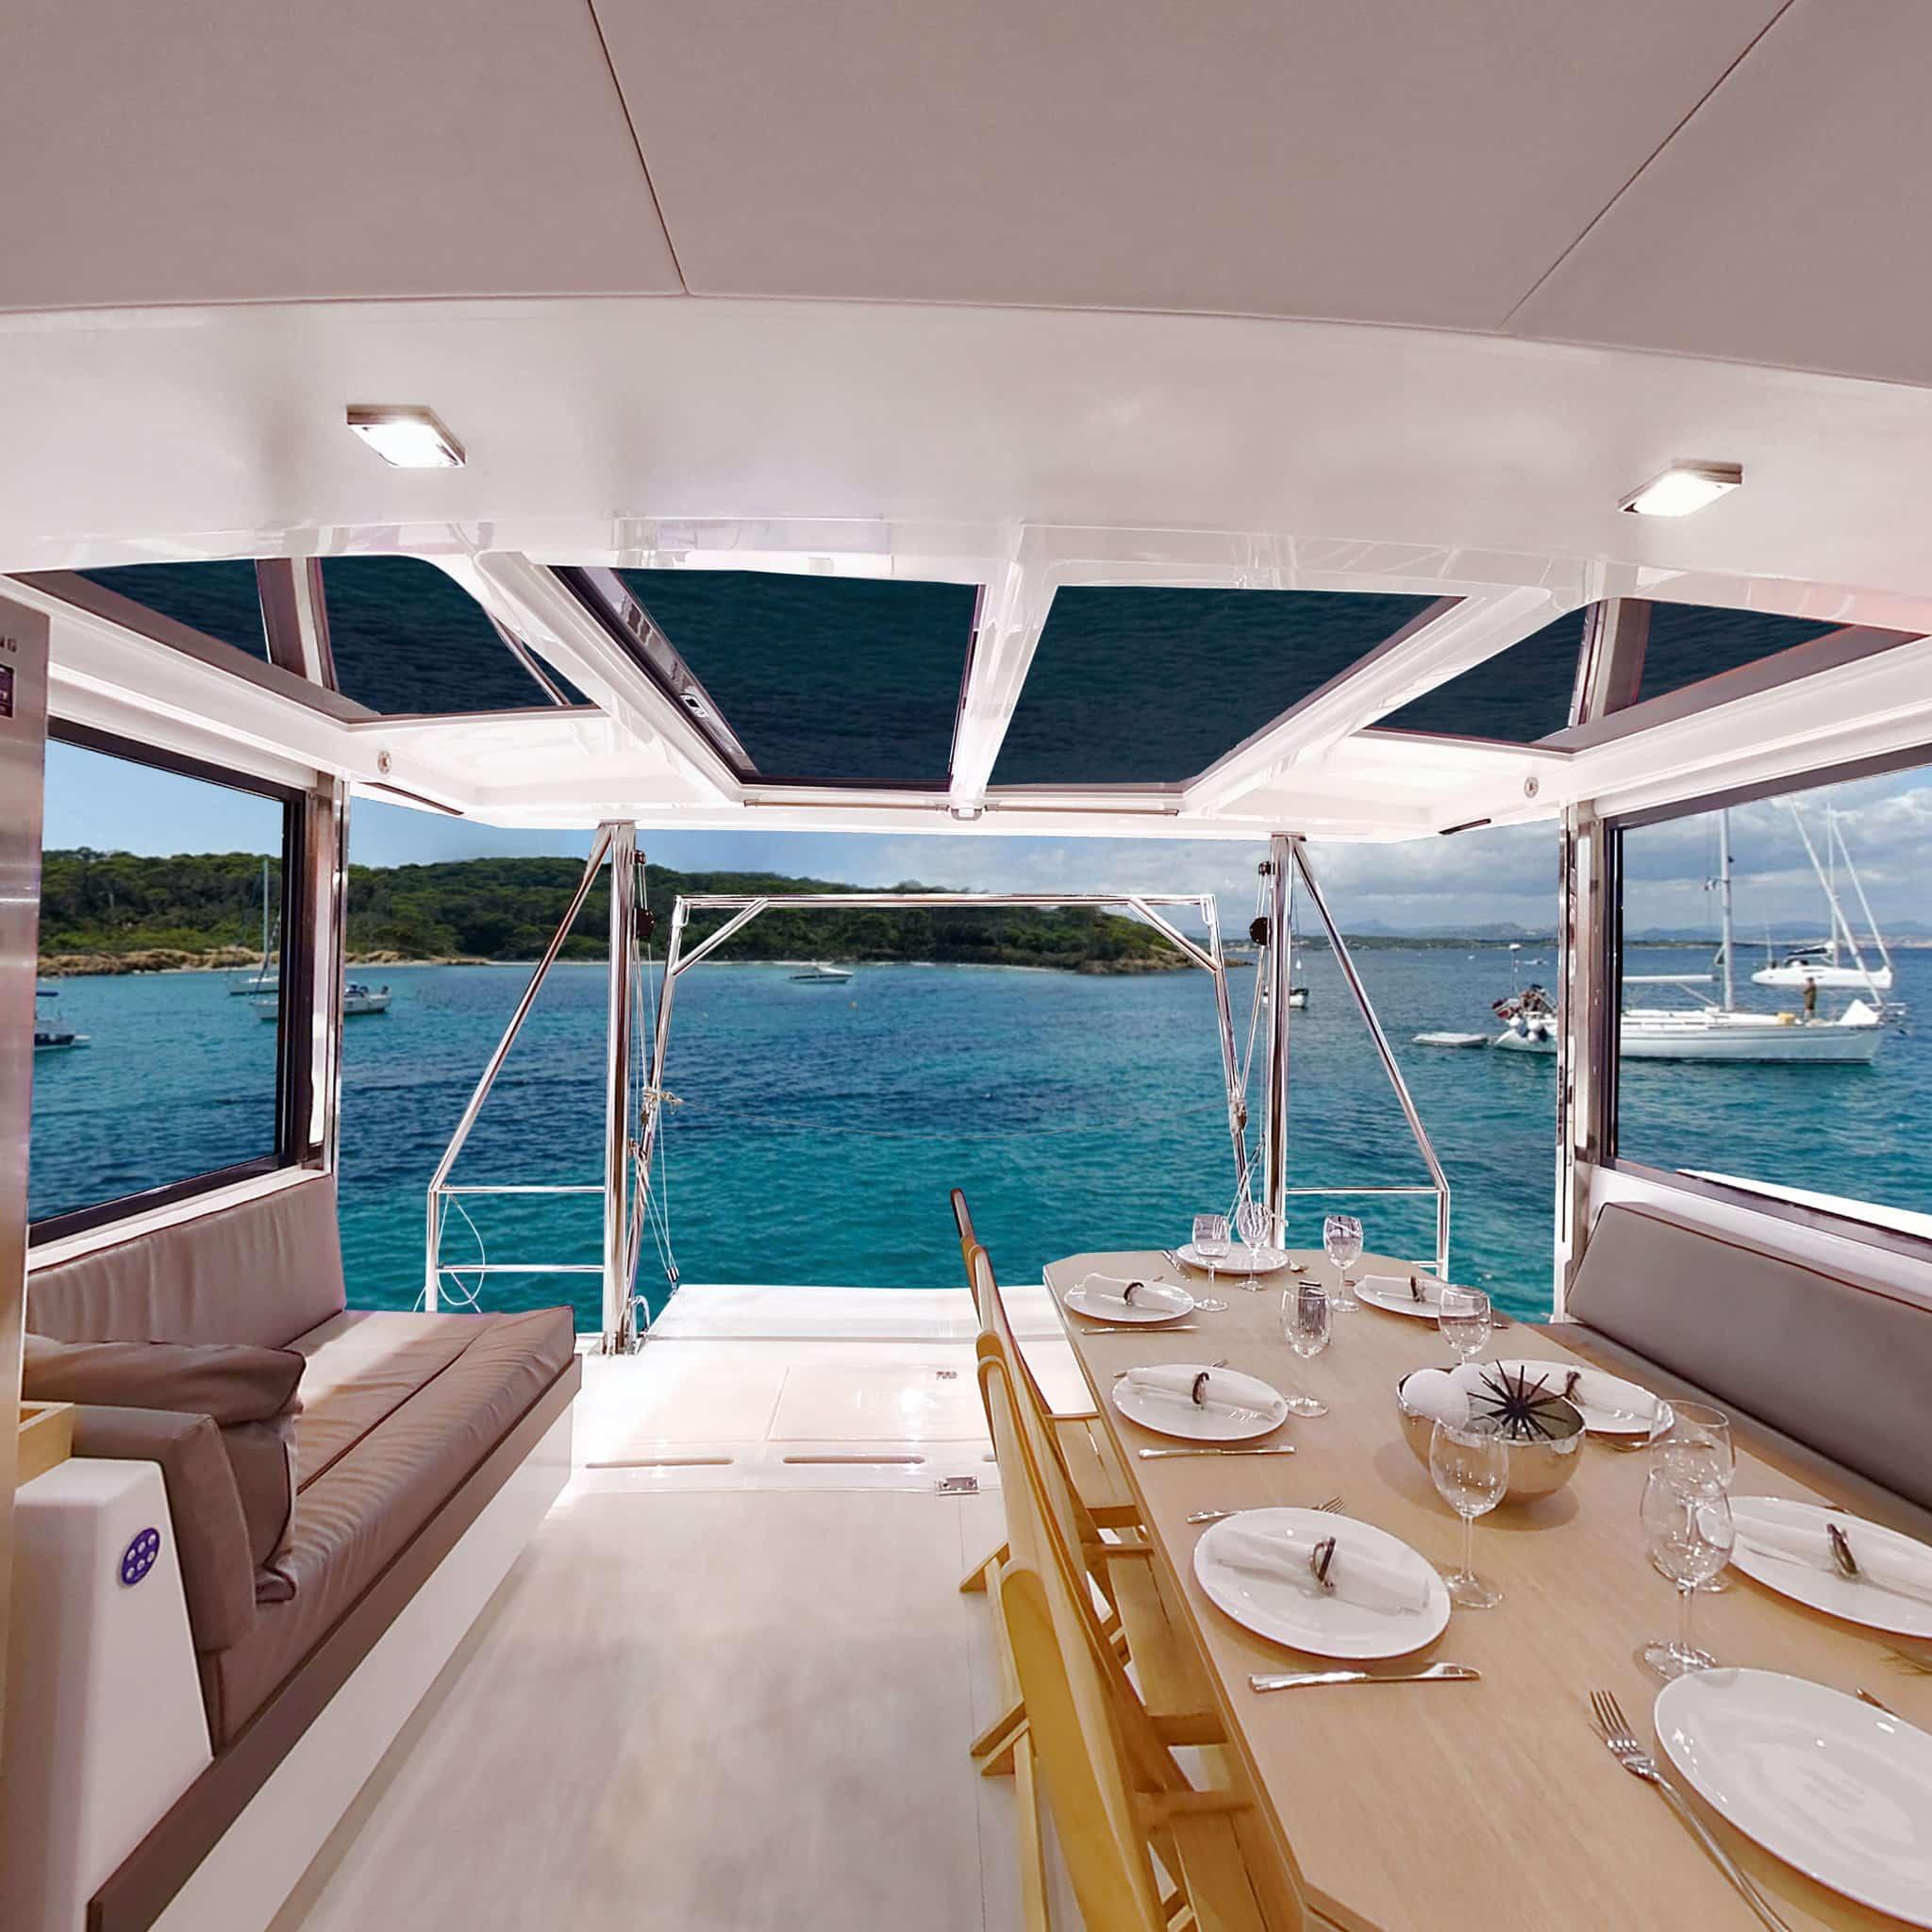 bali 4,3-yacht-charter-croatia-sailing-holidays-croatia-booking-yacht-charter-croatia-catamarans-sailboats-motorboats-gulets-luxury-yachts-boat-rental-croatia 8